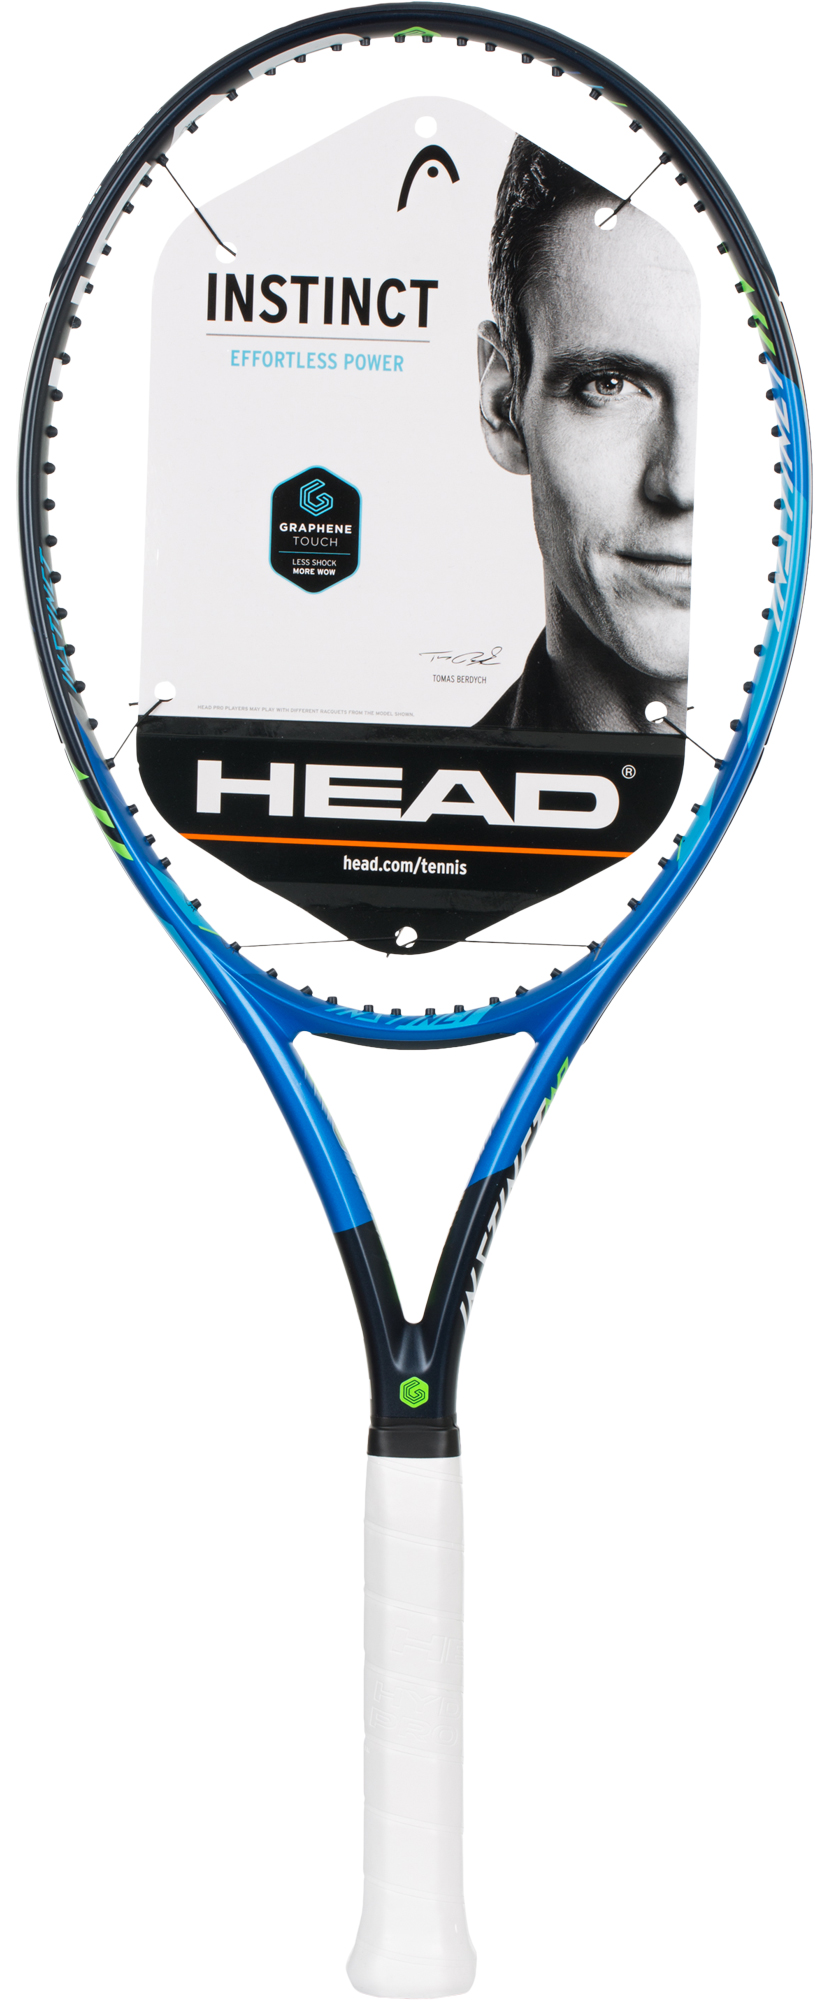 Head Ракетка для большого тенниса Head Graphene Touch Instinct MP, размер 4 head ракетка для большого тенниса детская head novak 23 размер без размера